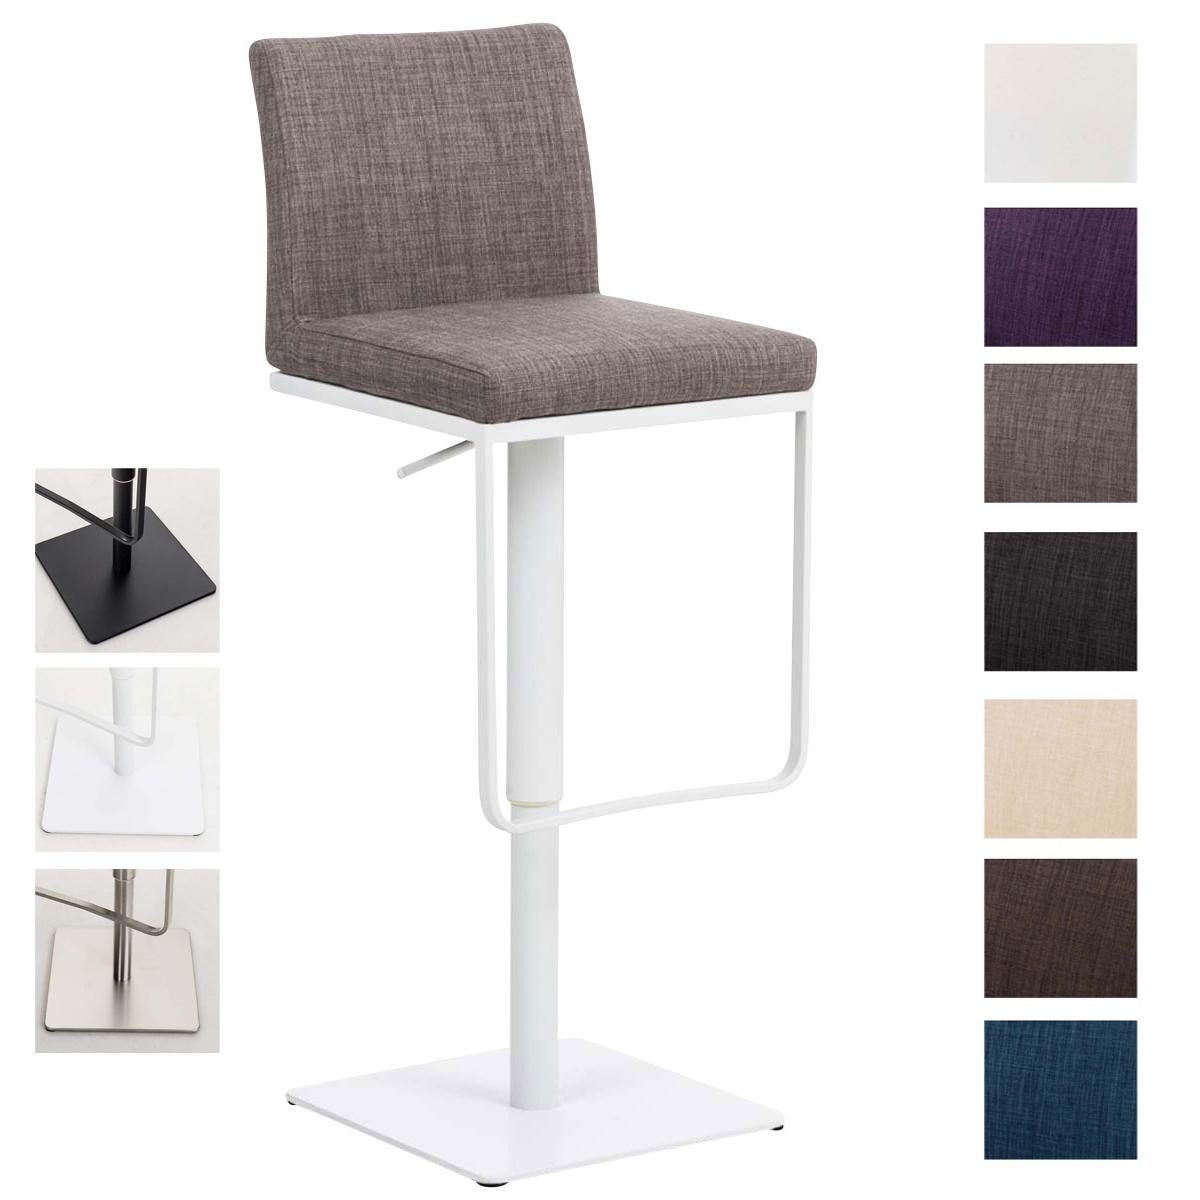 barhocker panama stoff barstuhl tresenhocker thekenhocker barstuhl drehbar ebay. Black Bedroom Furniture Sets. Home Design Ideas